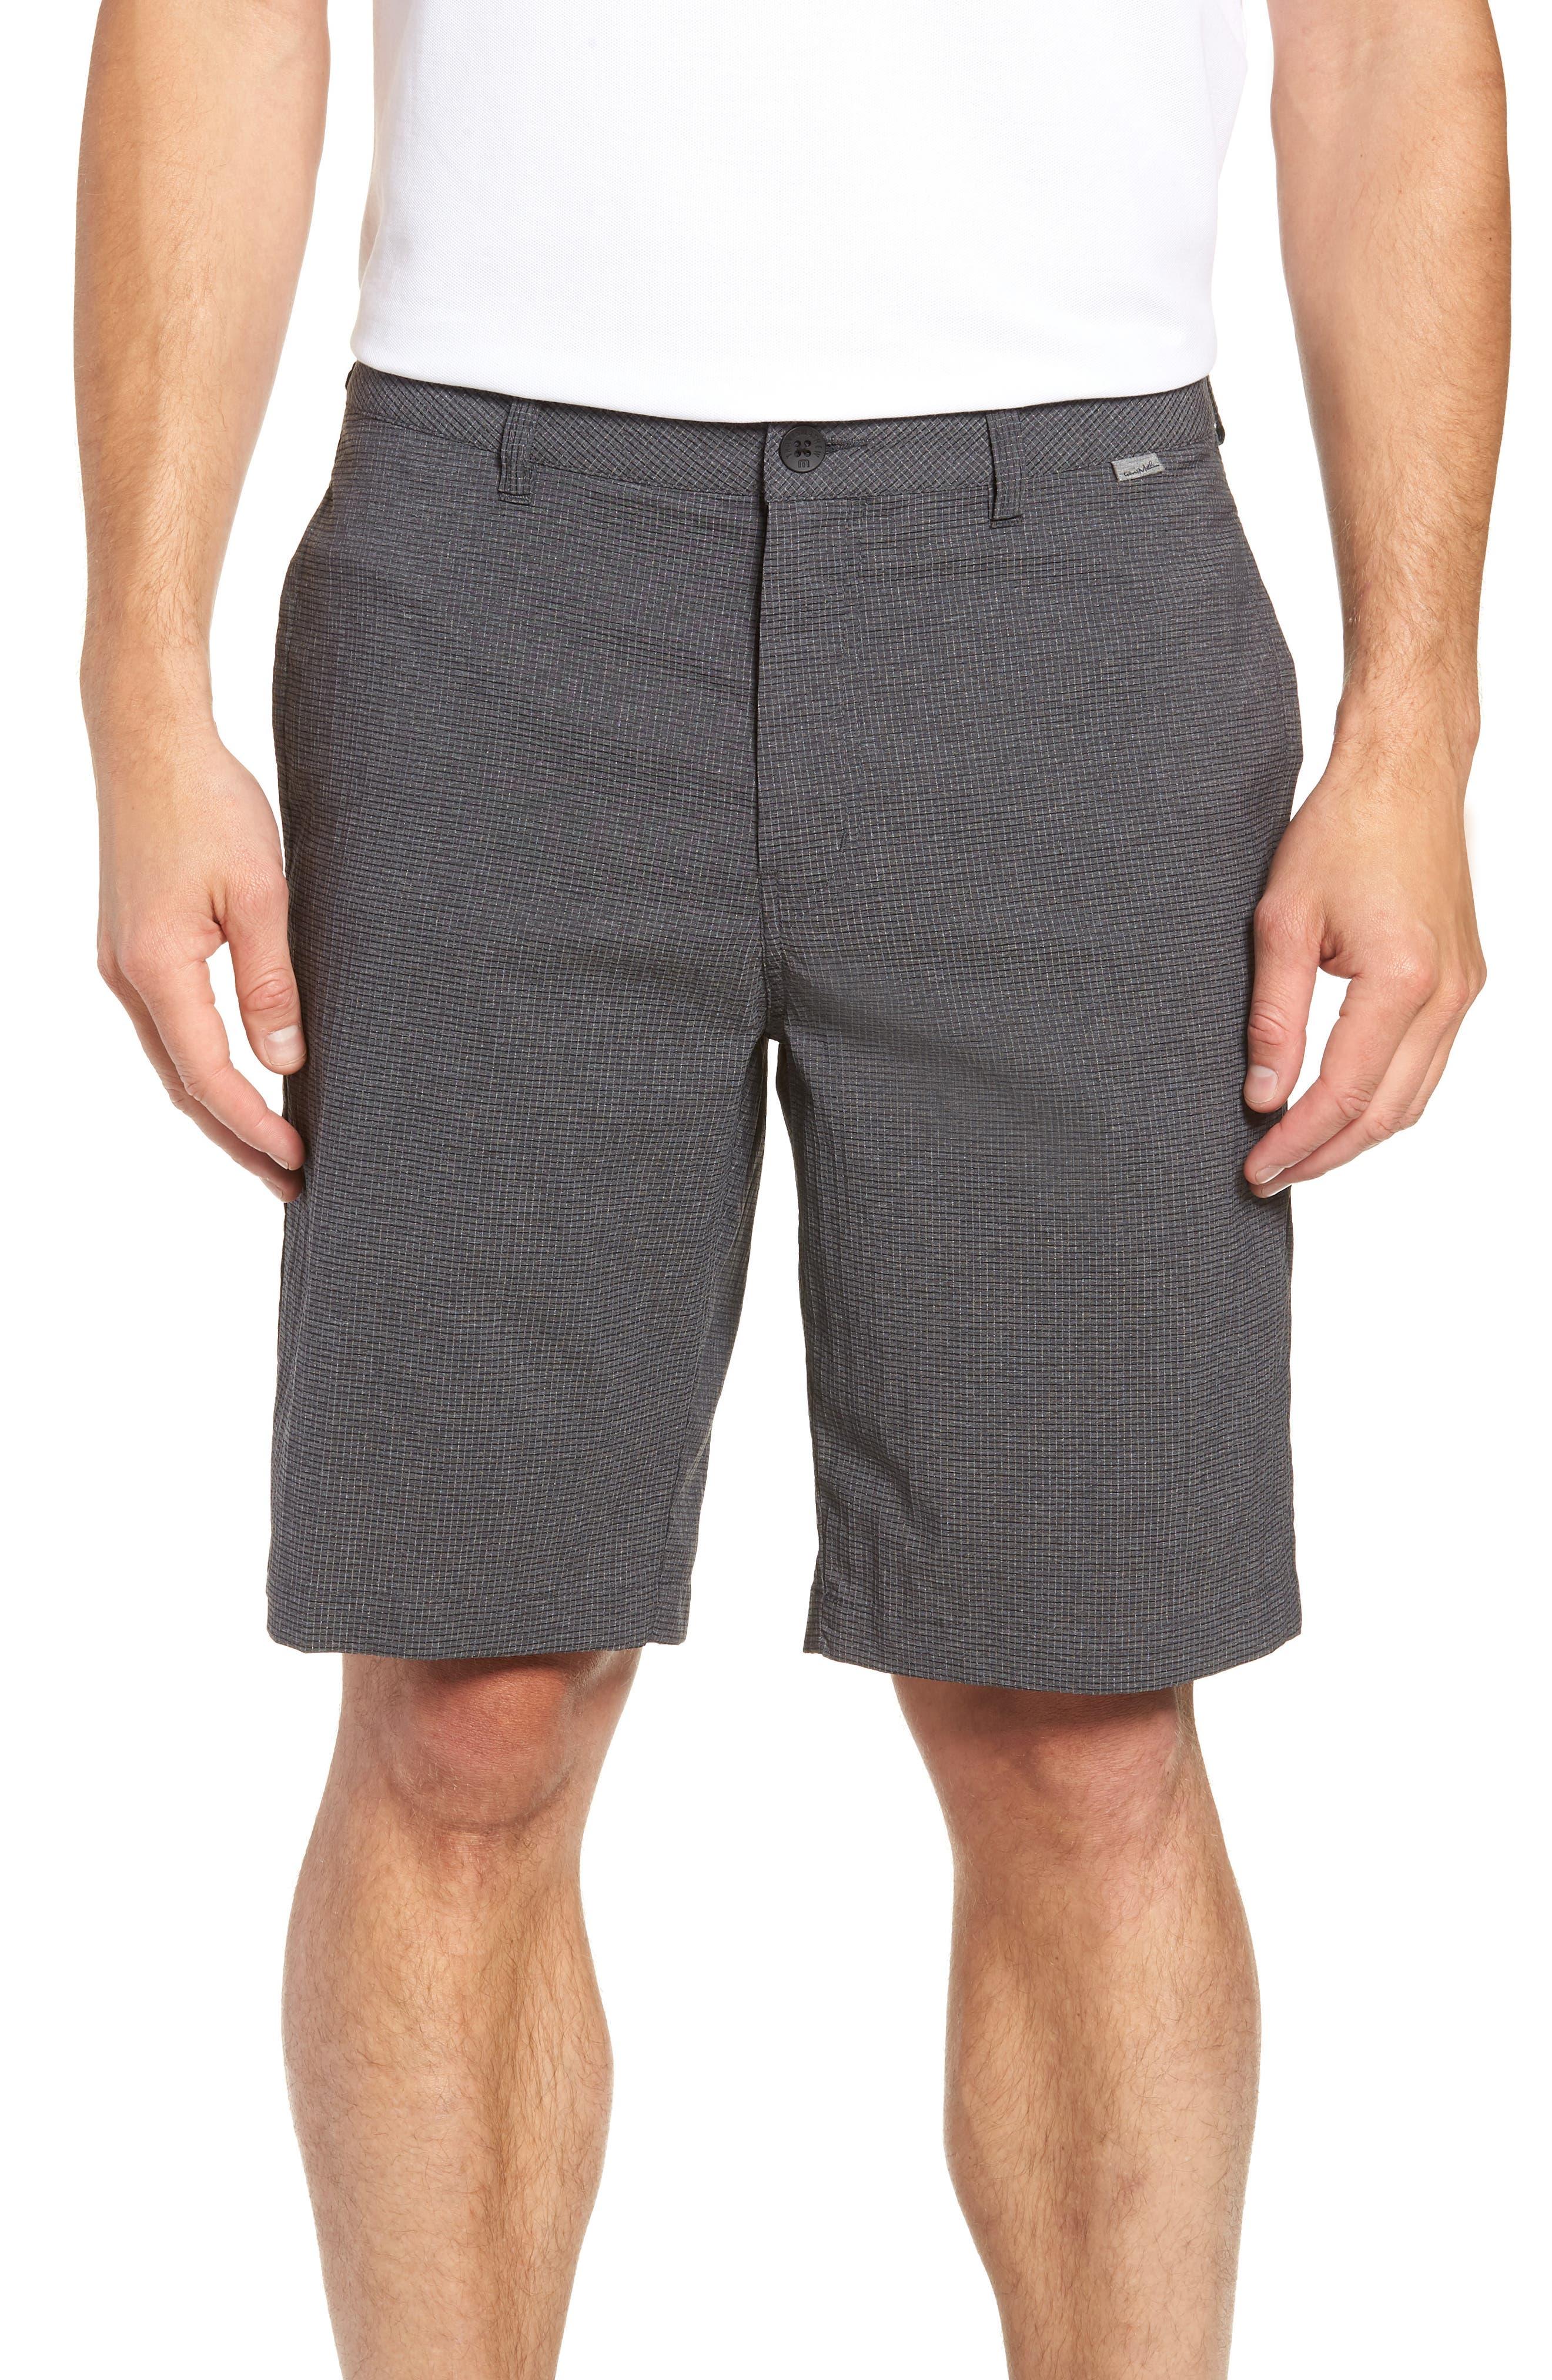 Peel Out Shorts,                         Main,                         color, GREY PINSTRIPE